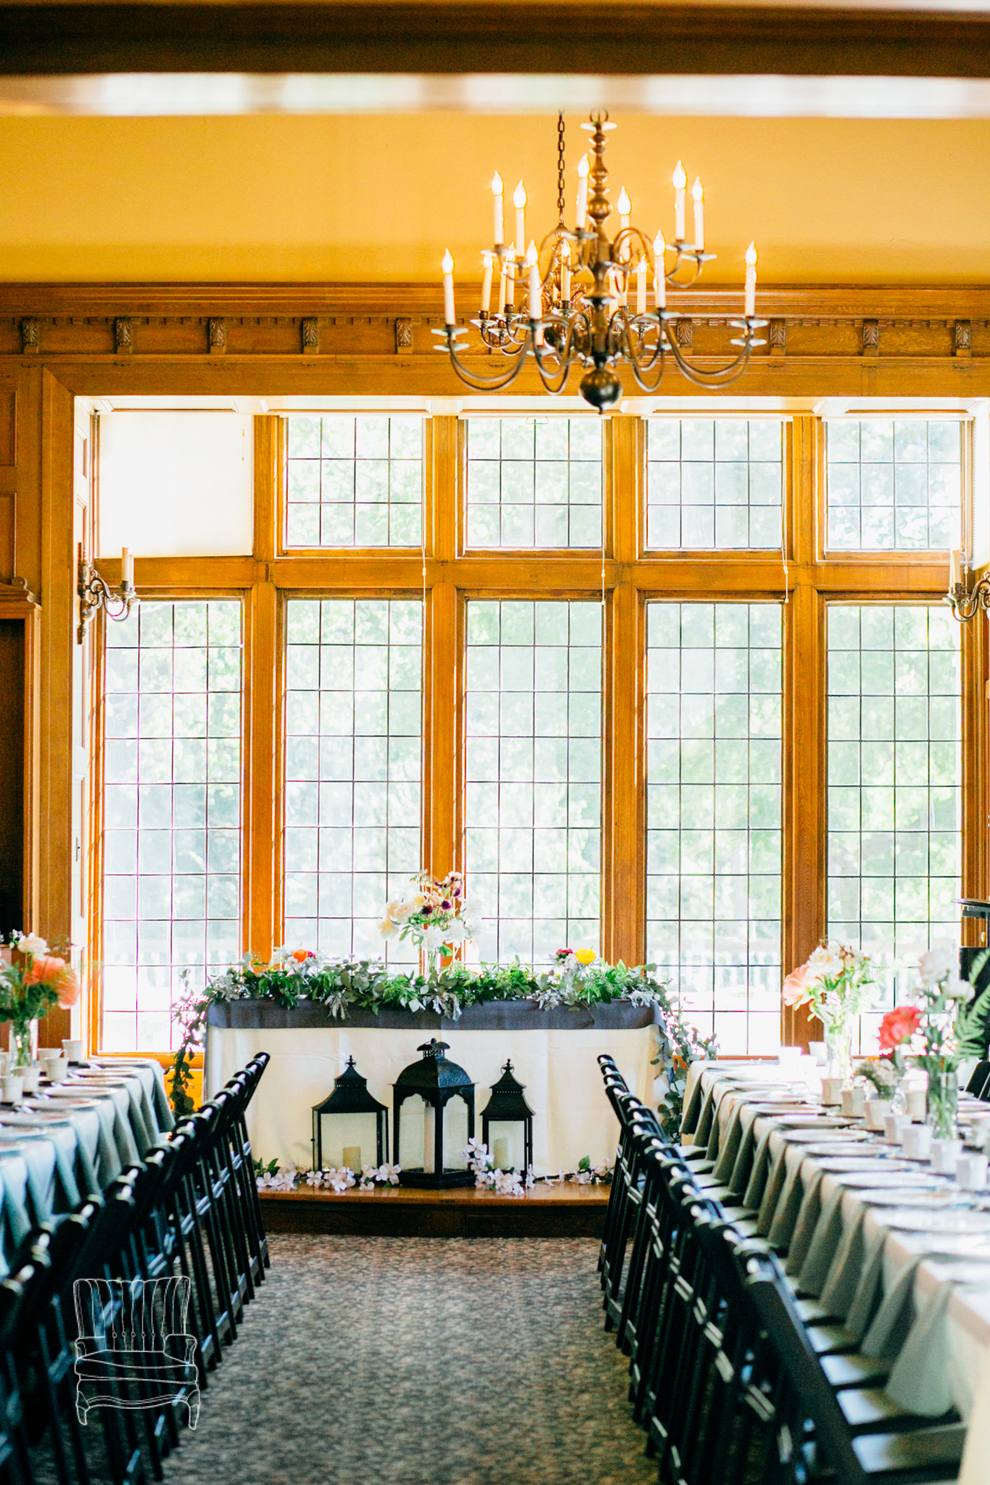 013-lairmont-manor-bellingham-washington-wedding-venue-katheryn-moran-photography-marketing.jpg